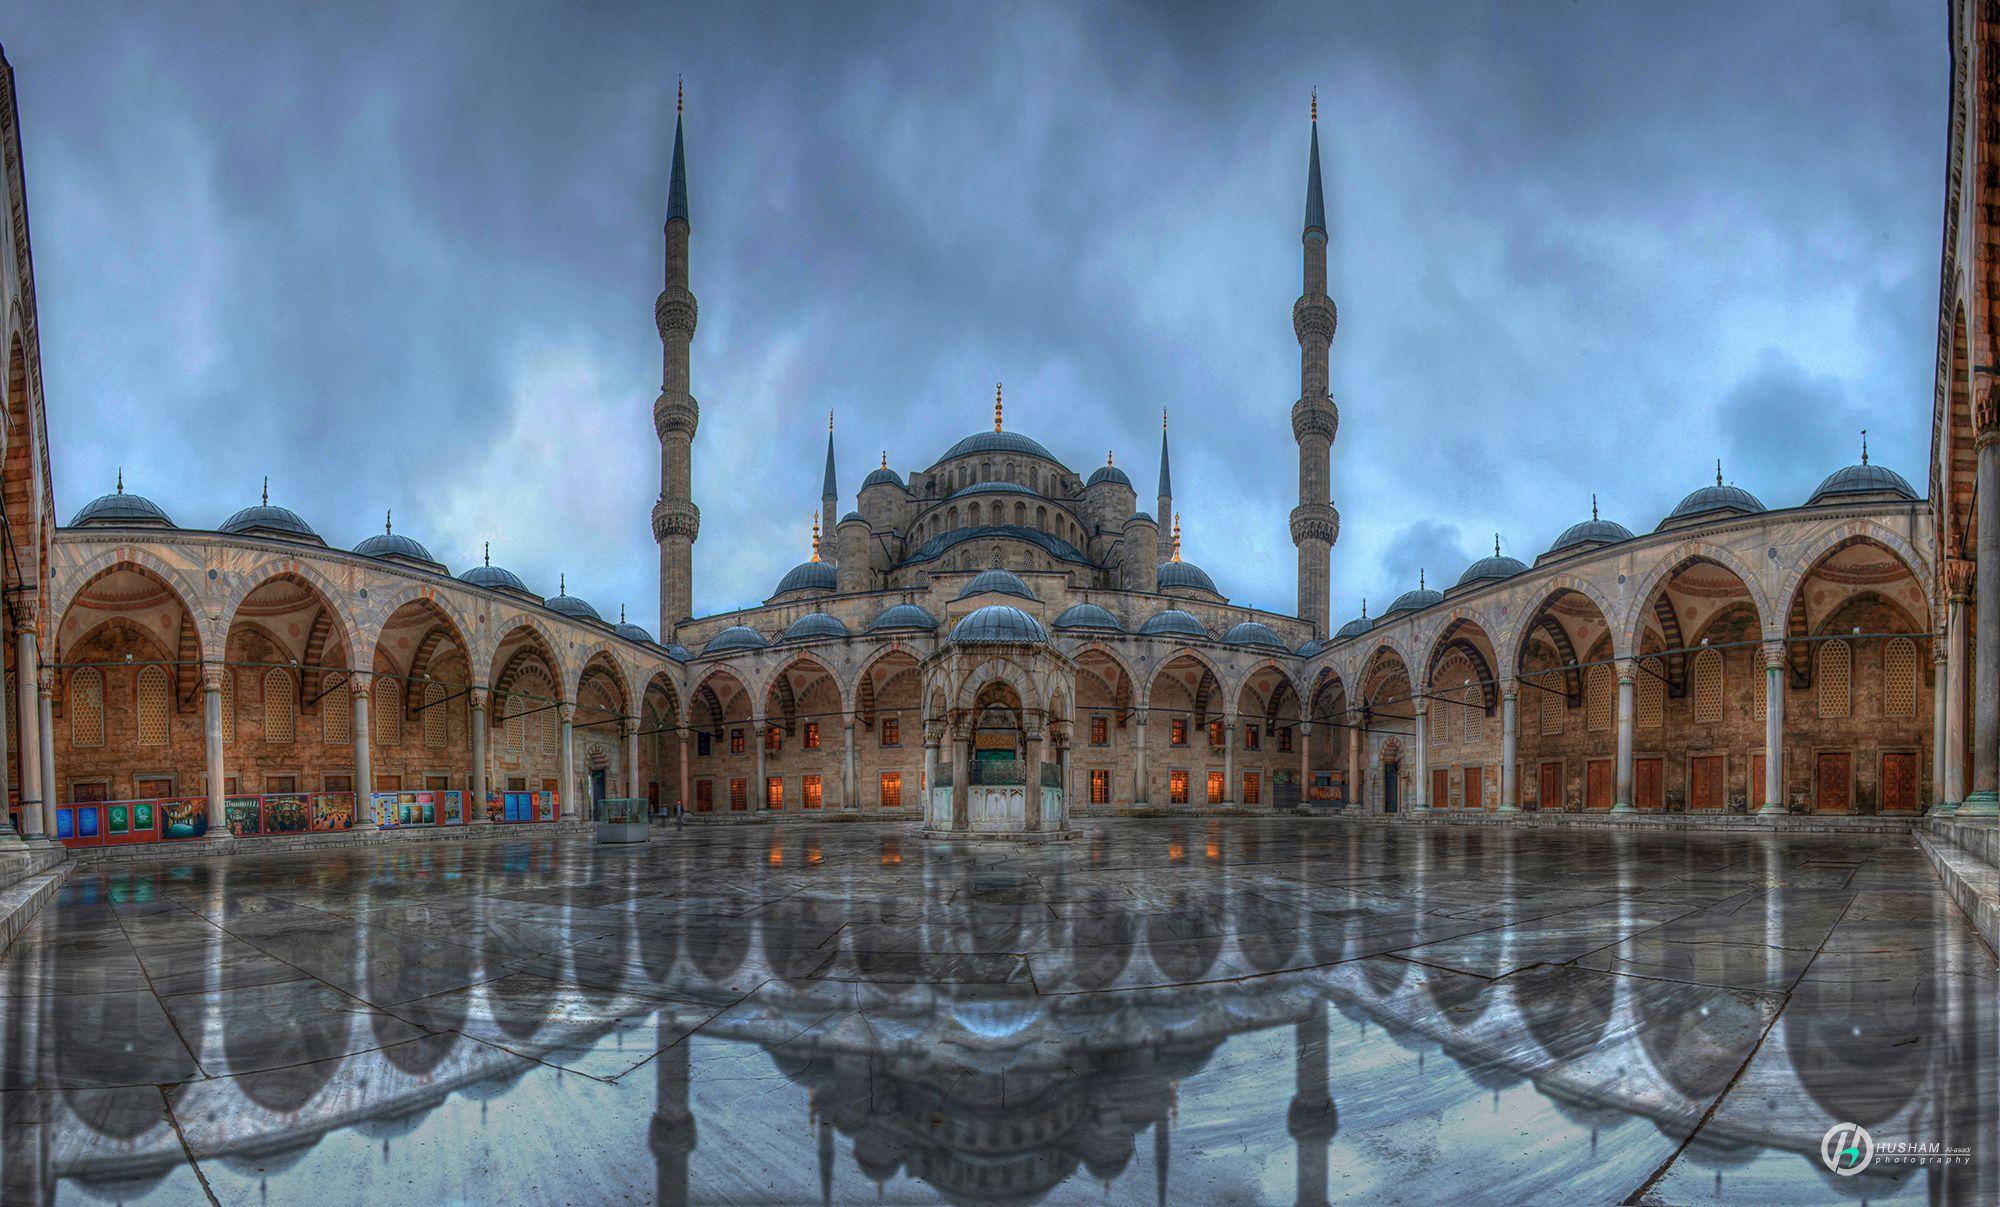 Photograph Blue Mosque by husham alasadi on 500px